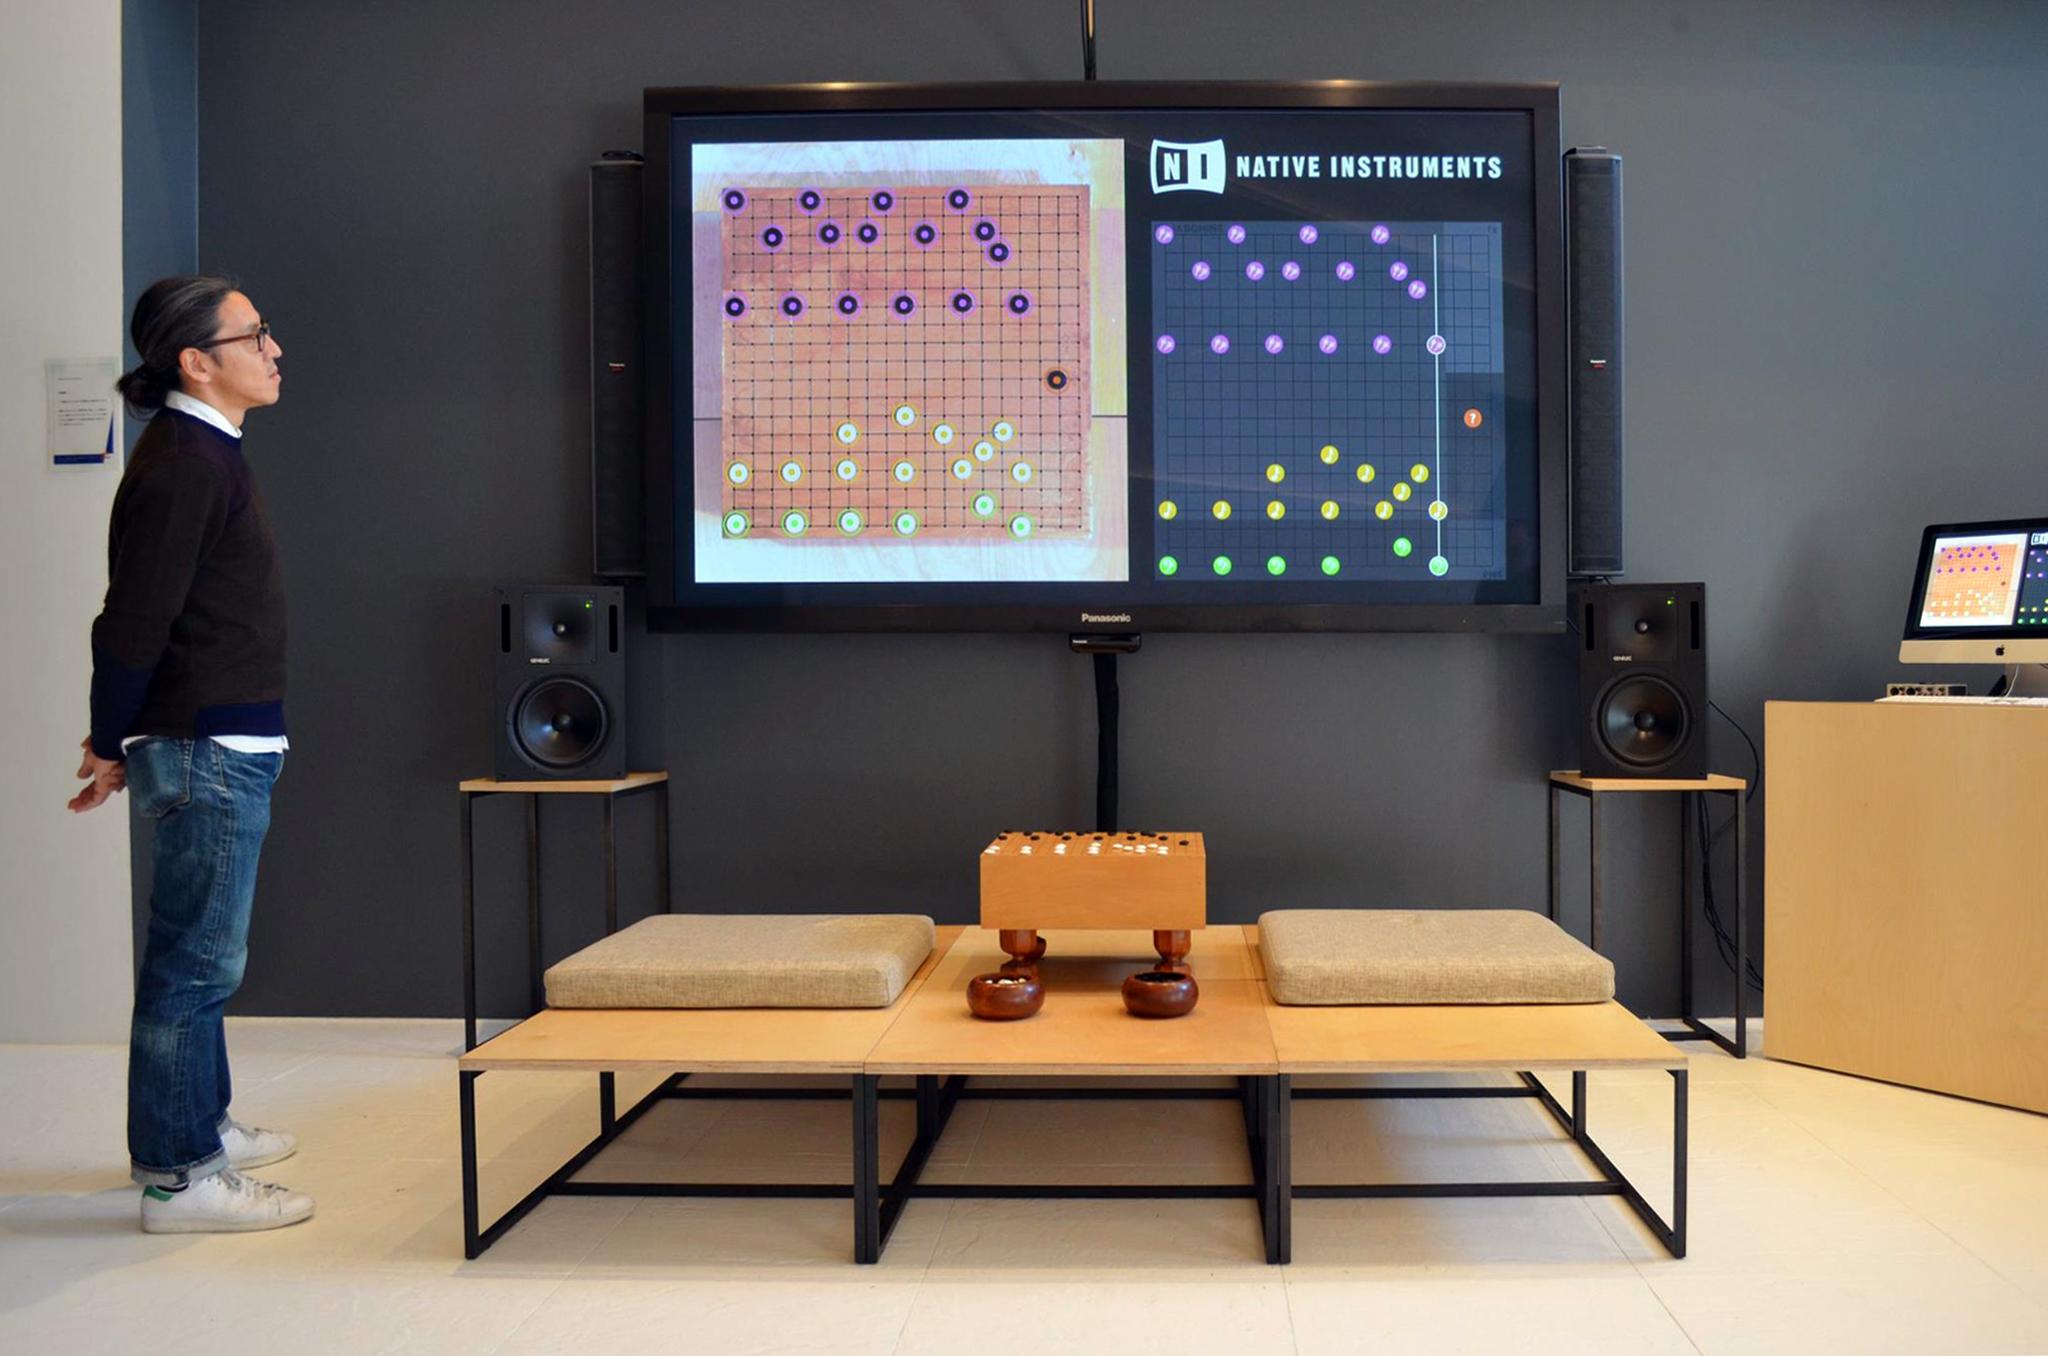 Go 囲碁 Maschine